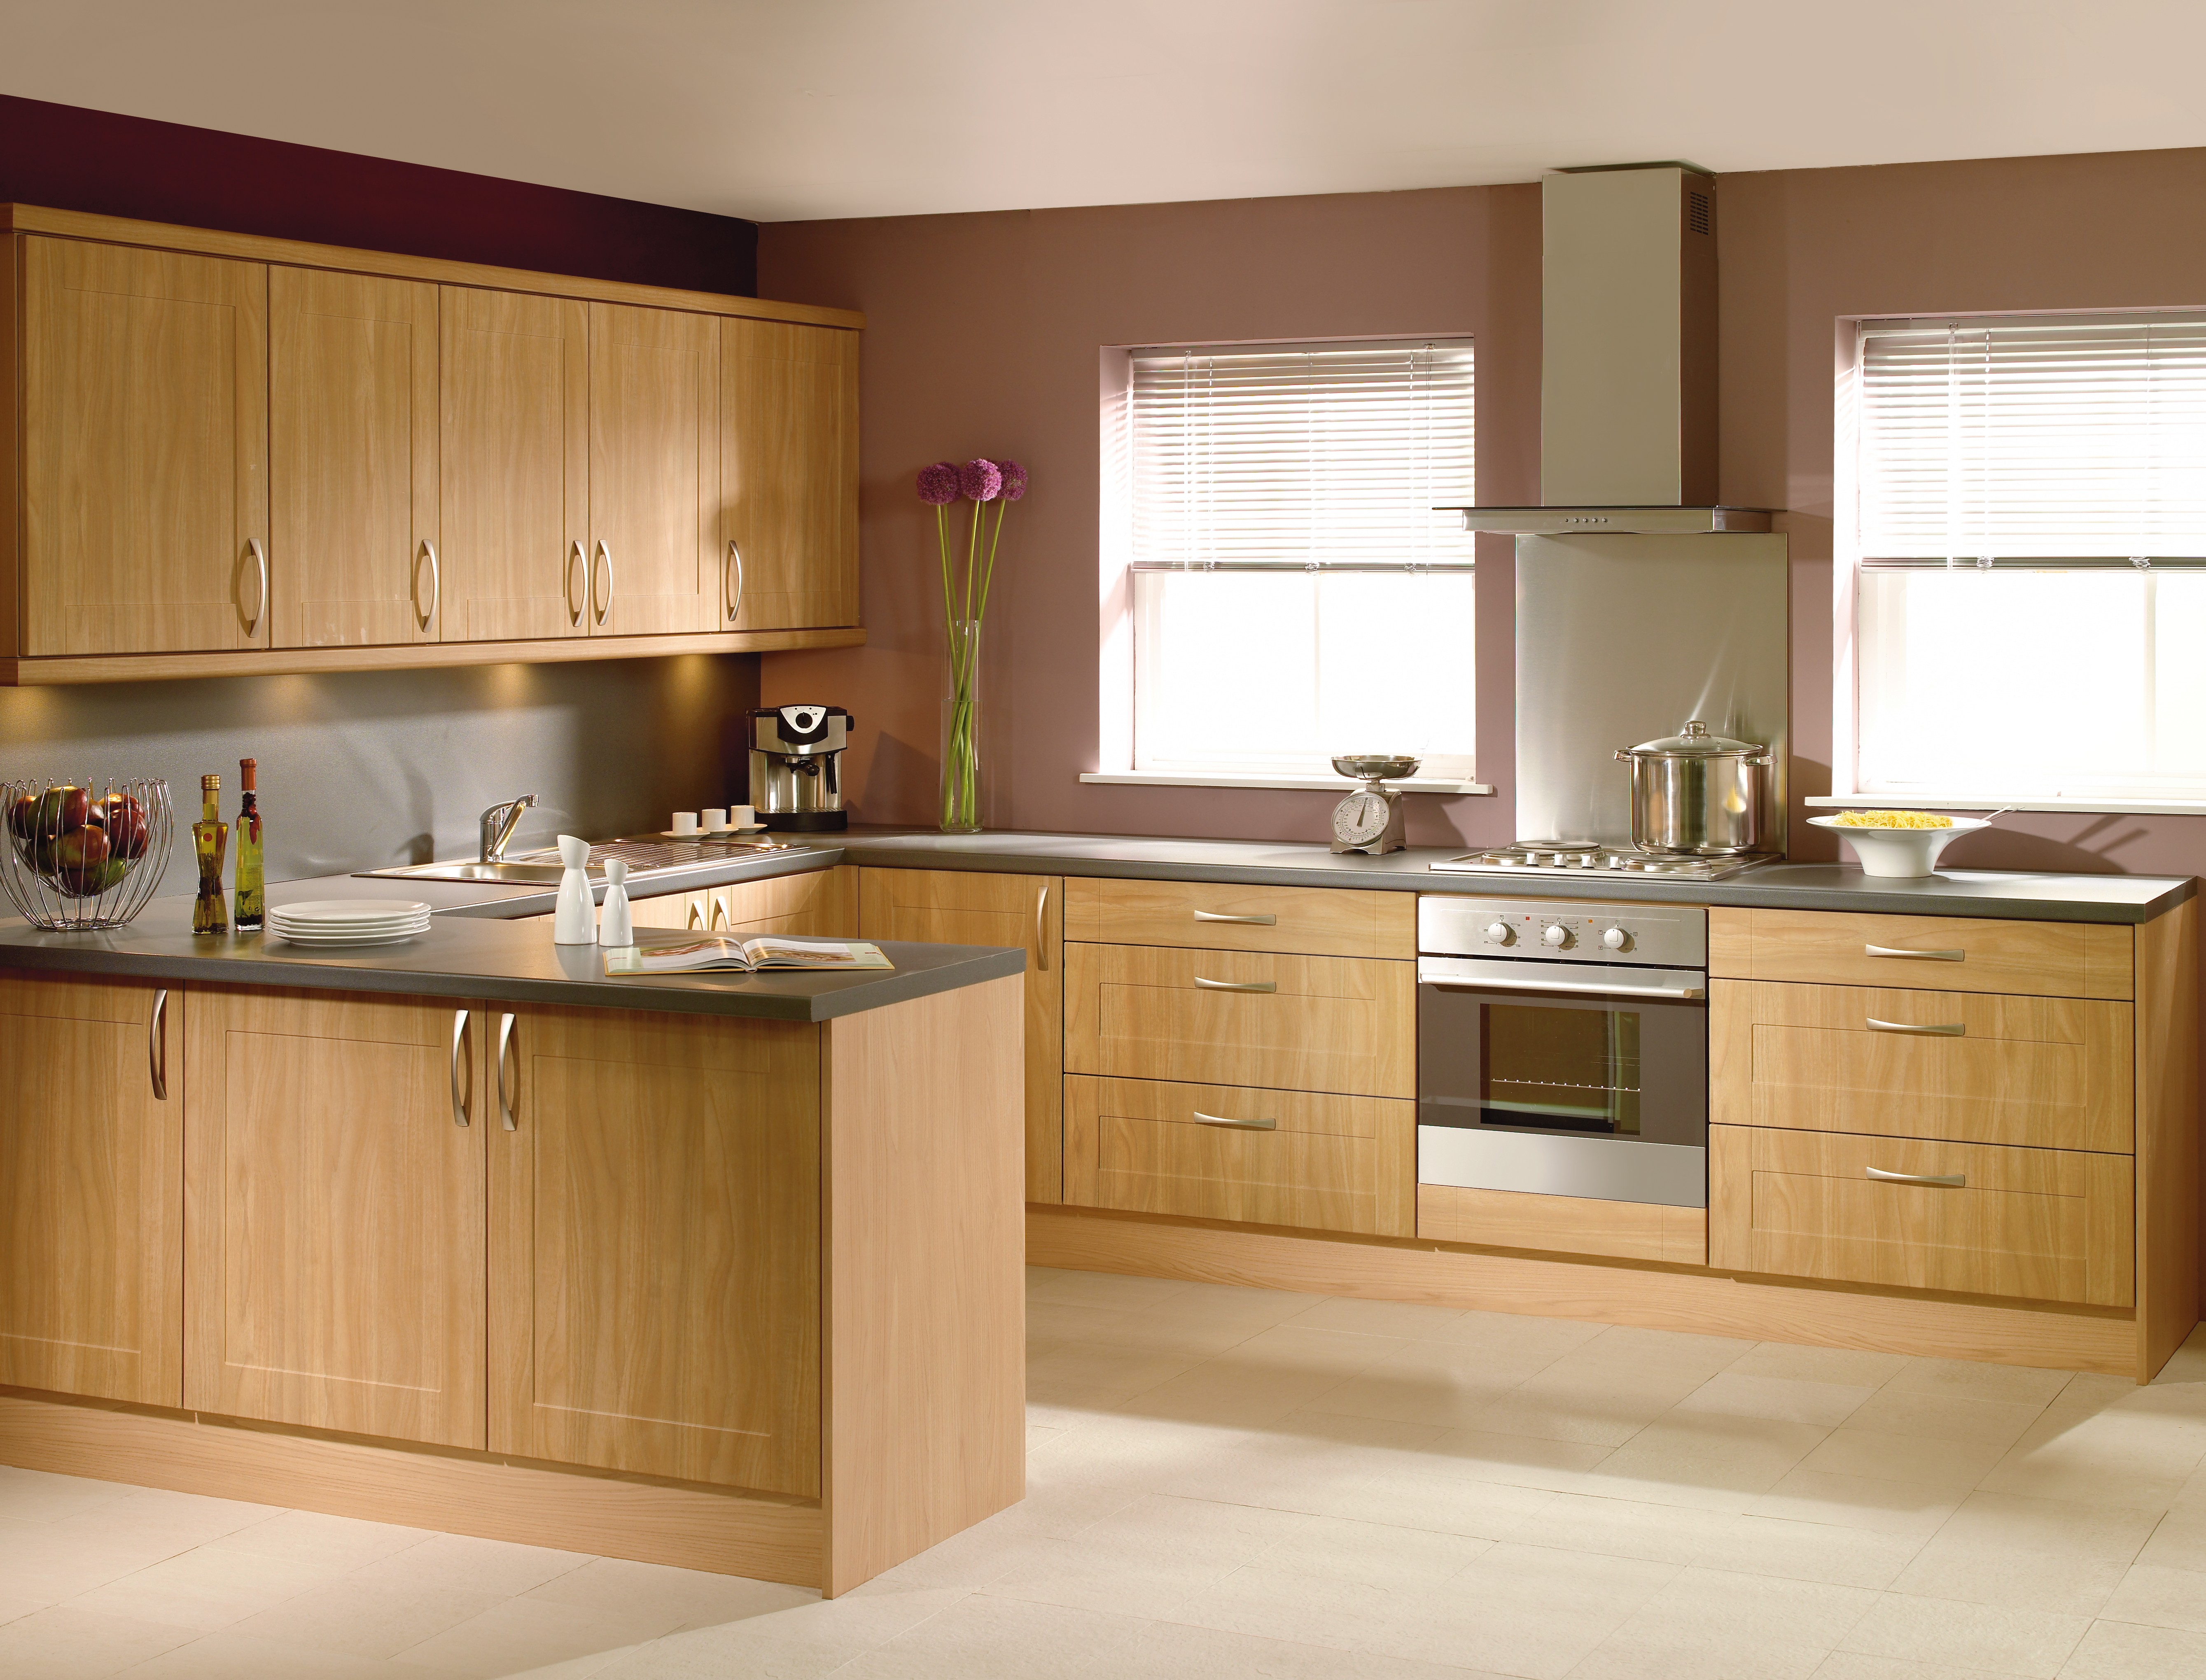 Perfect Kitchen Colors Perfect Kitchen Colorsperfect Kitchen Colors Better Homes .